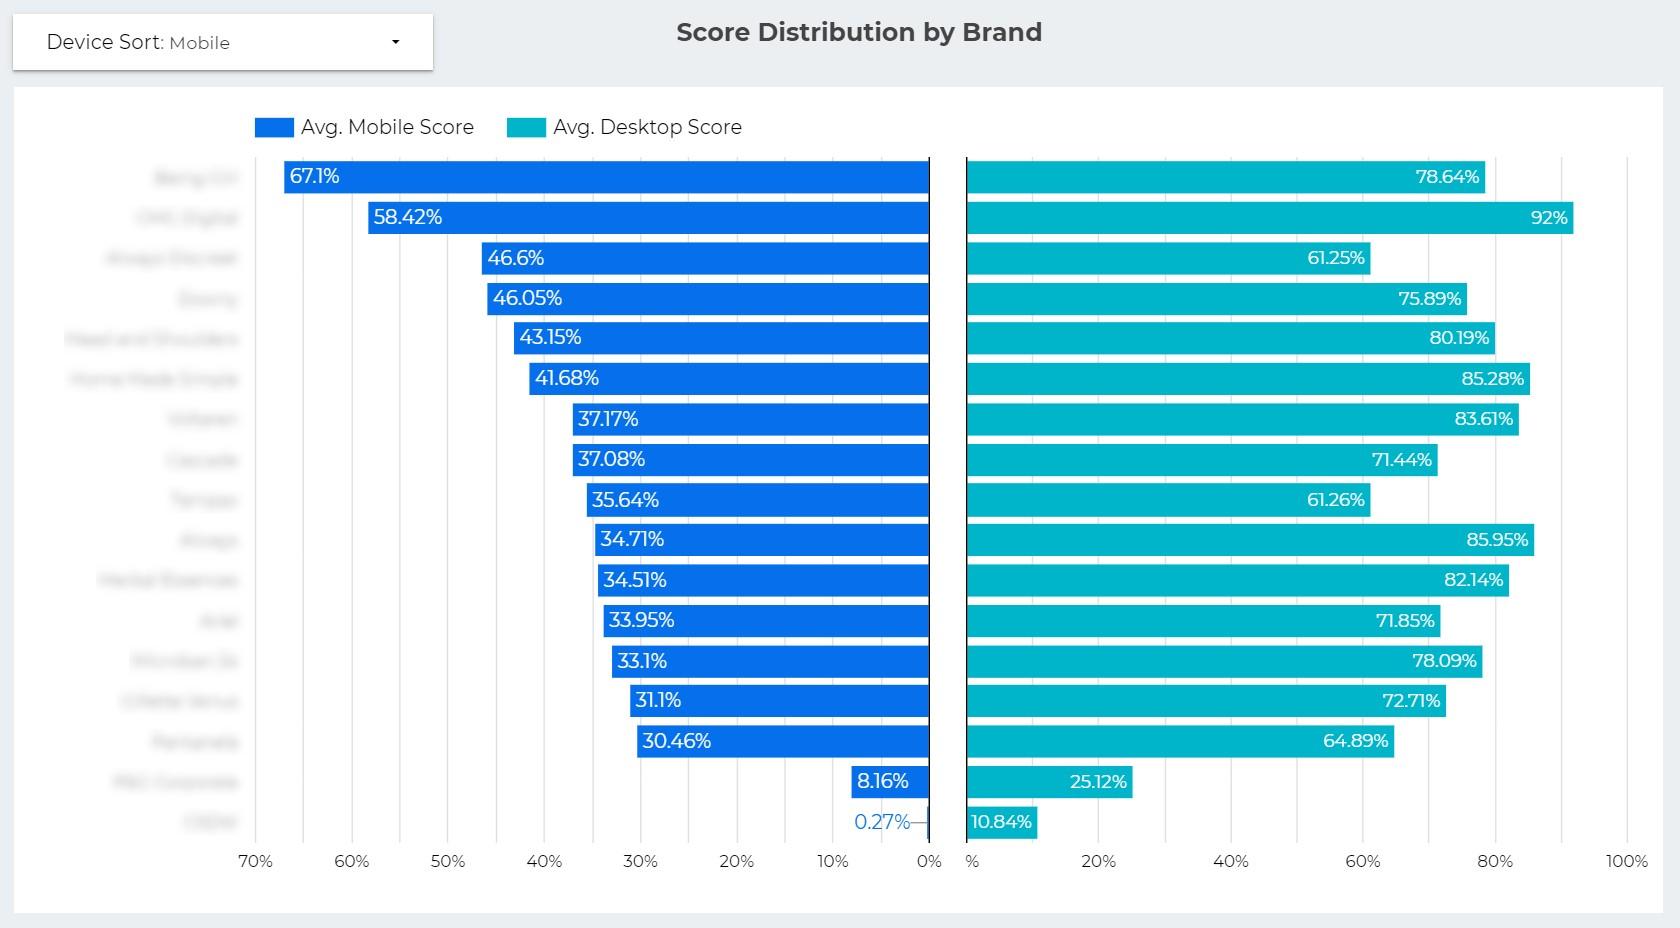 score distribution by brand